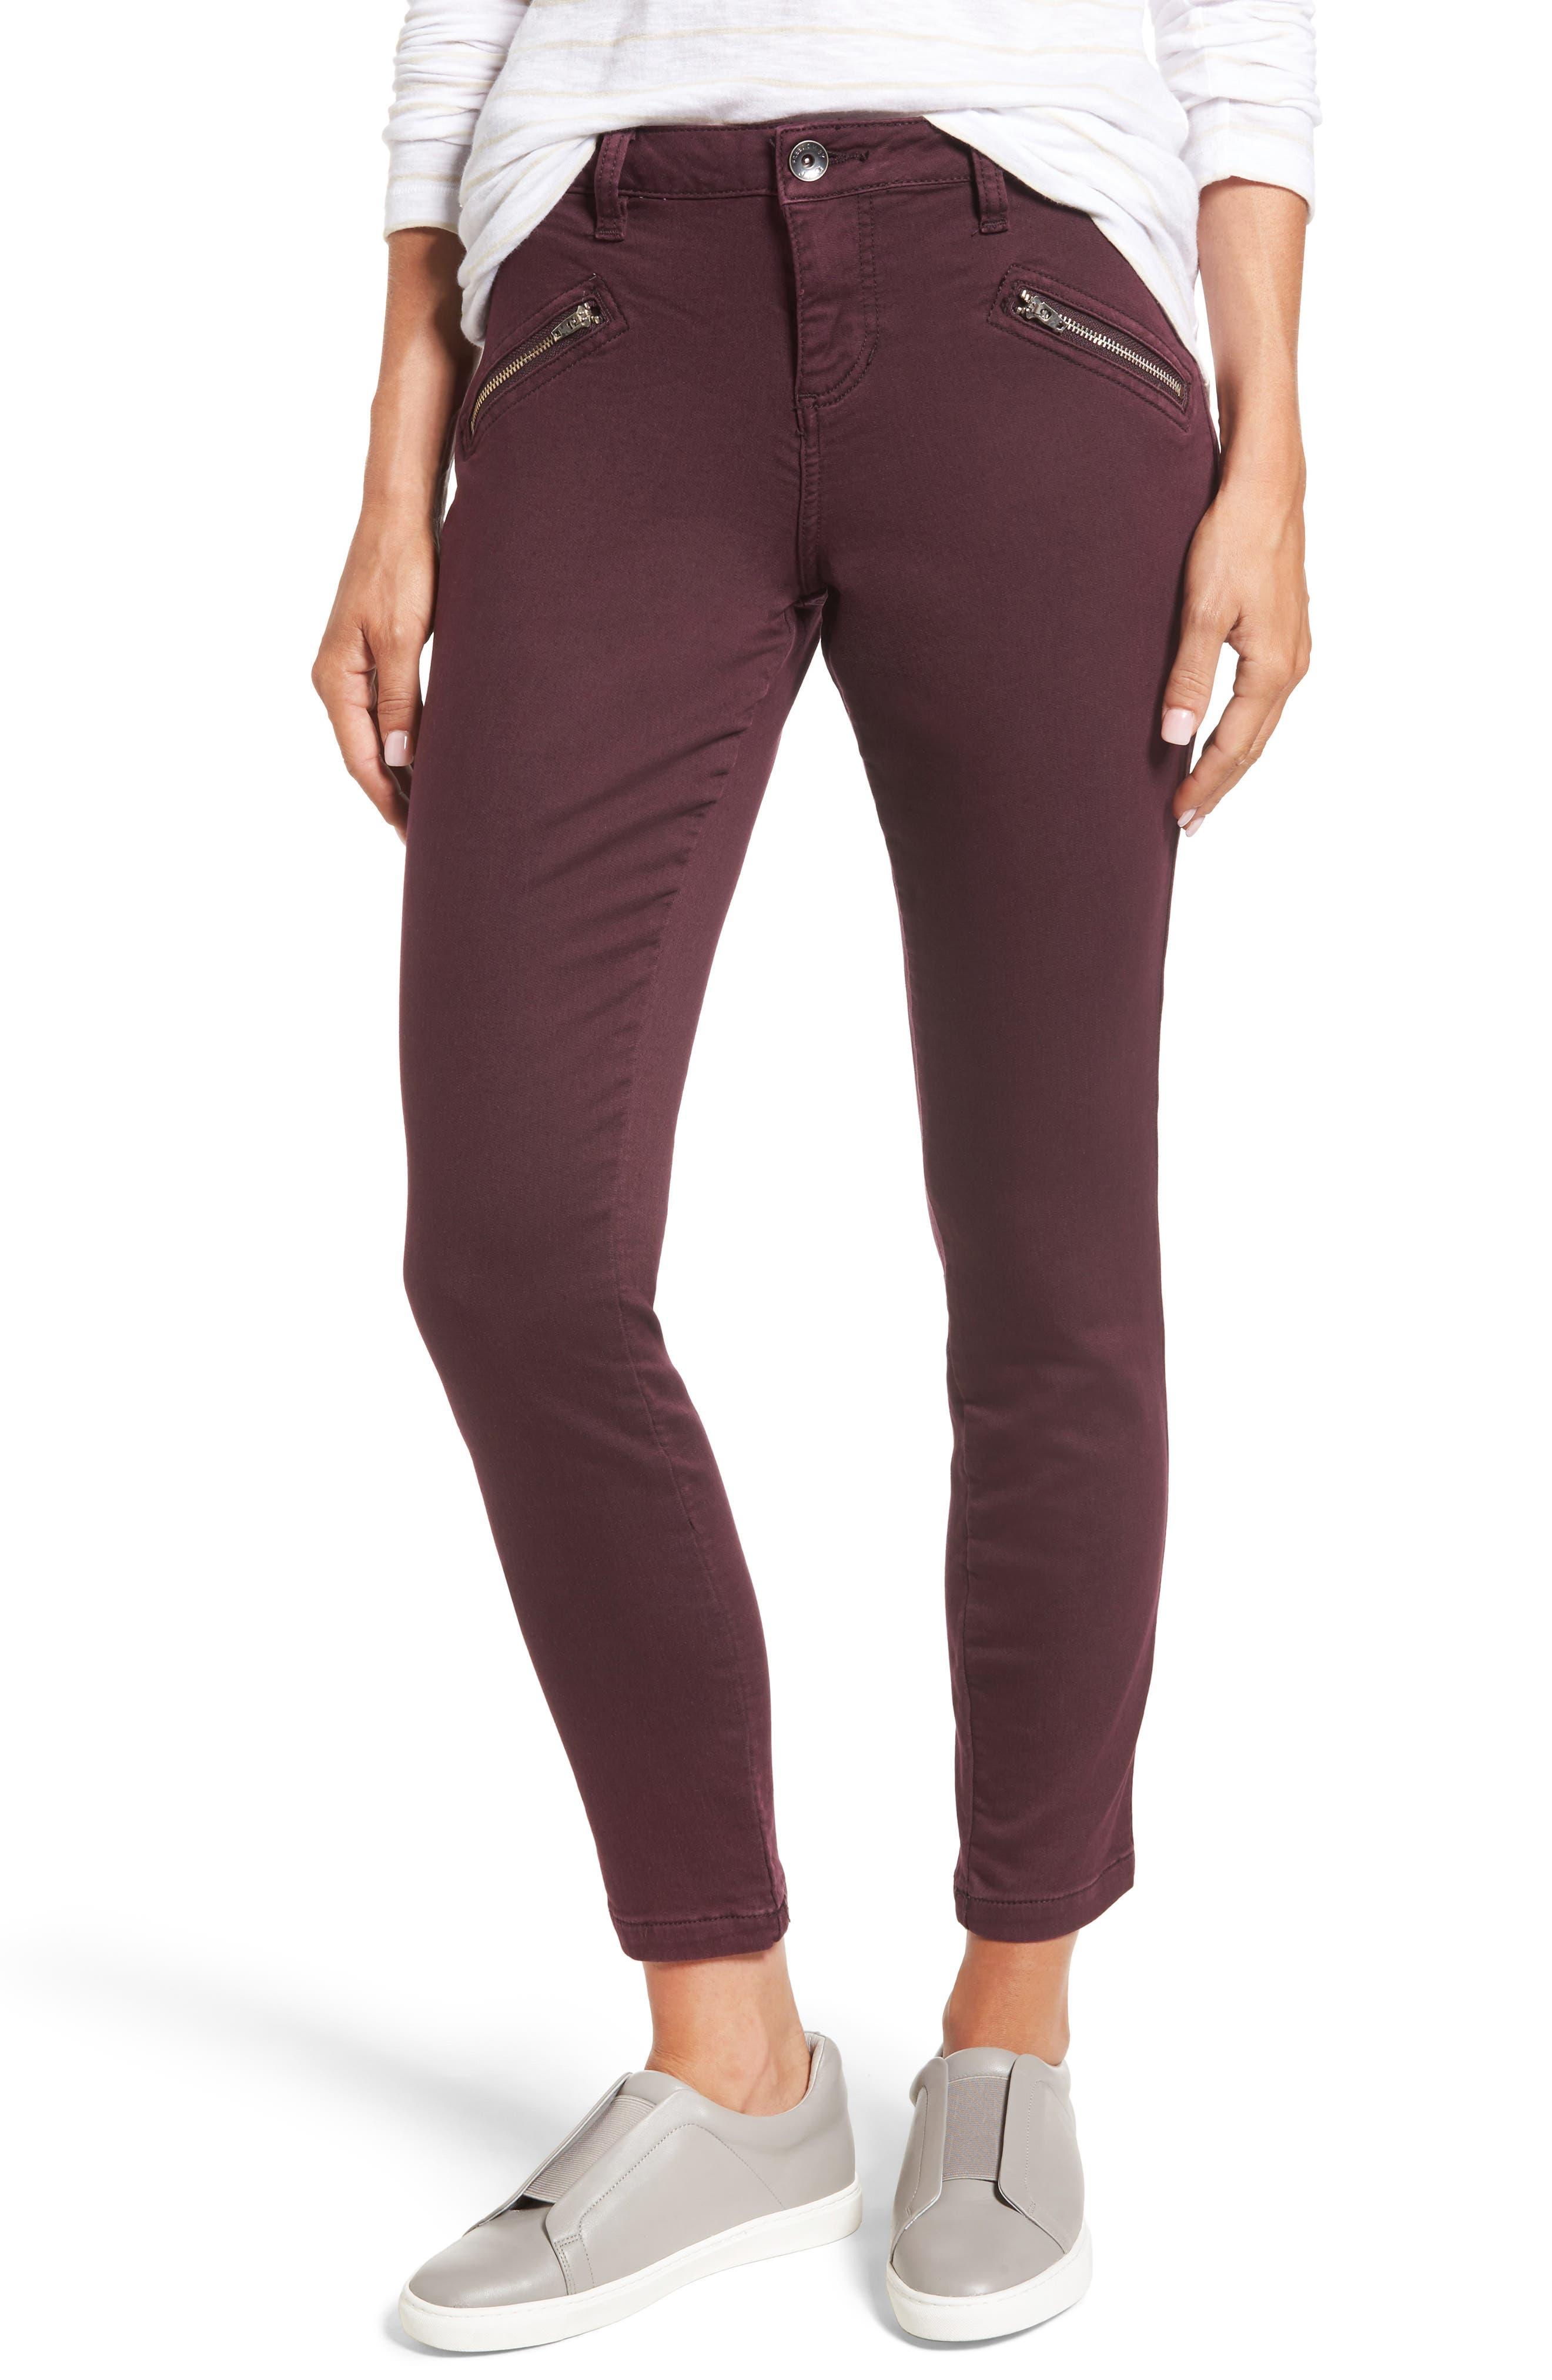 Ryan Knit Skinny Jeans,                         Main,                         color, Plum Noir